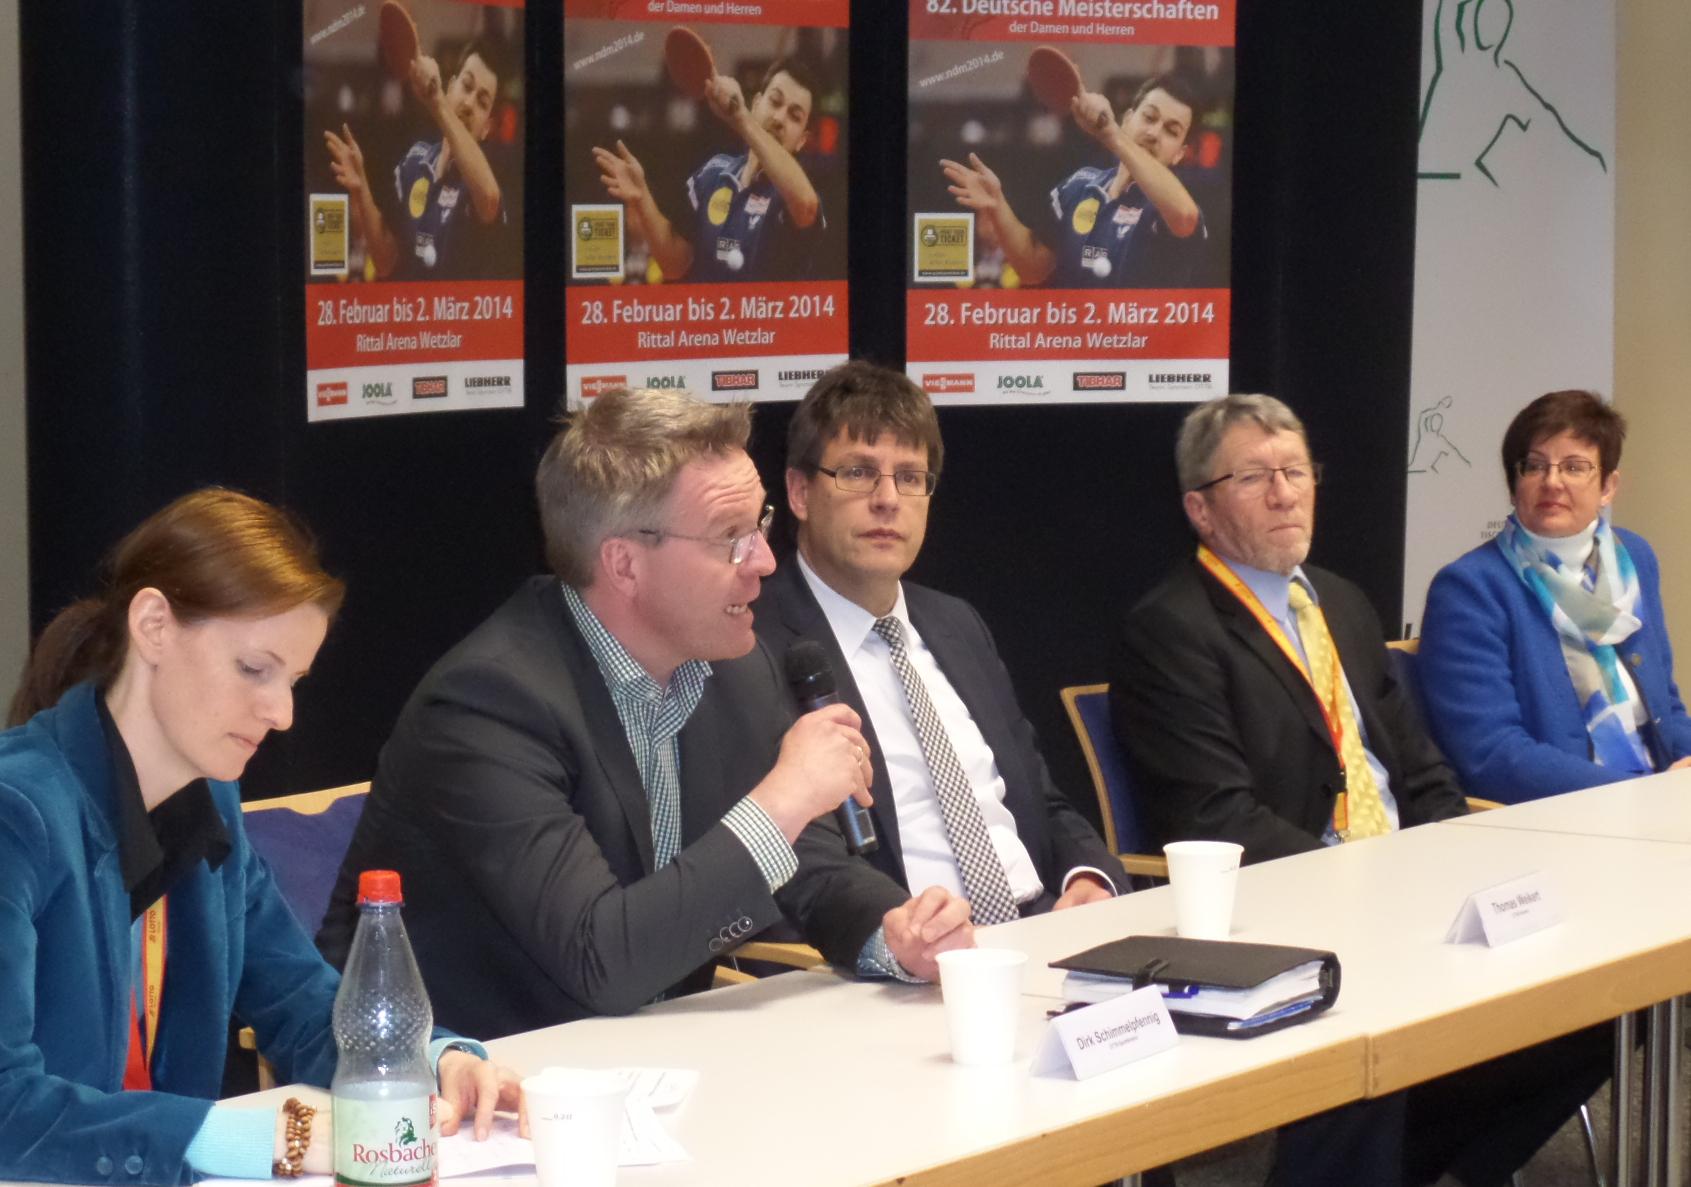 images/Bilanz-Pressekonferenz.jpg